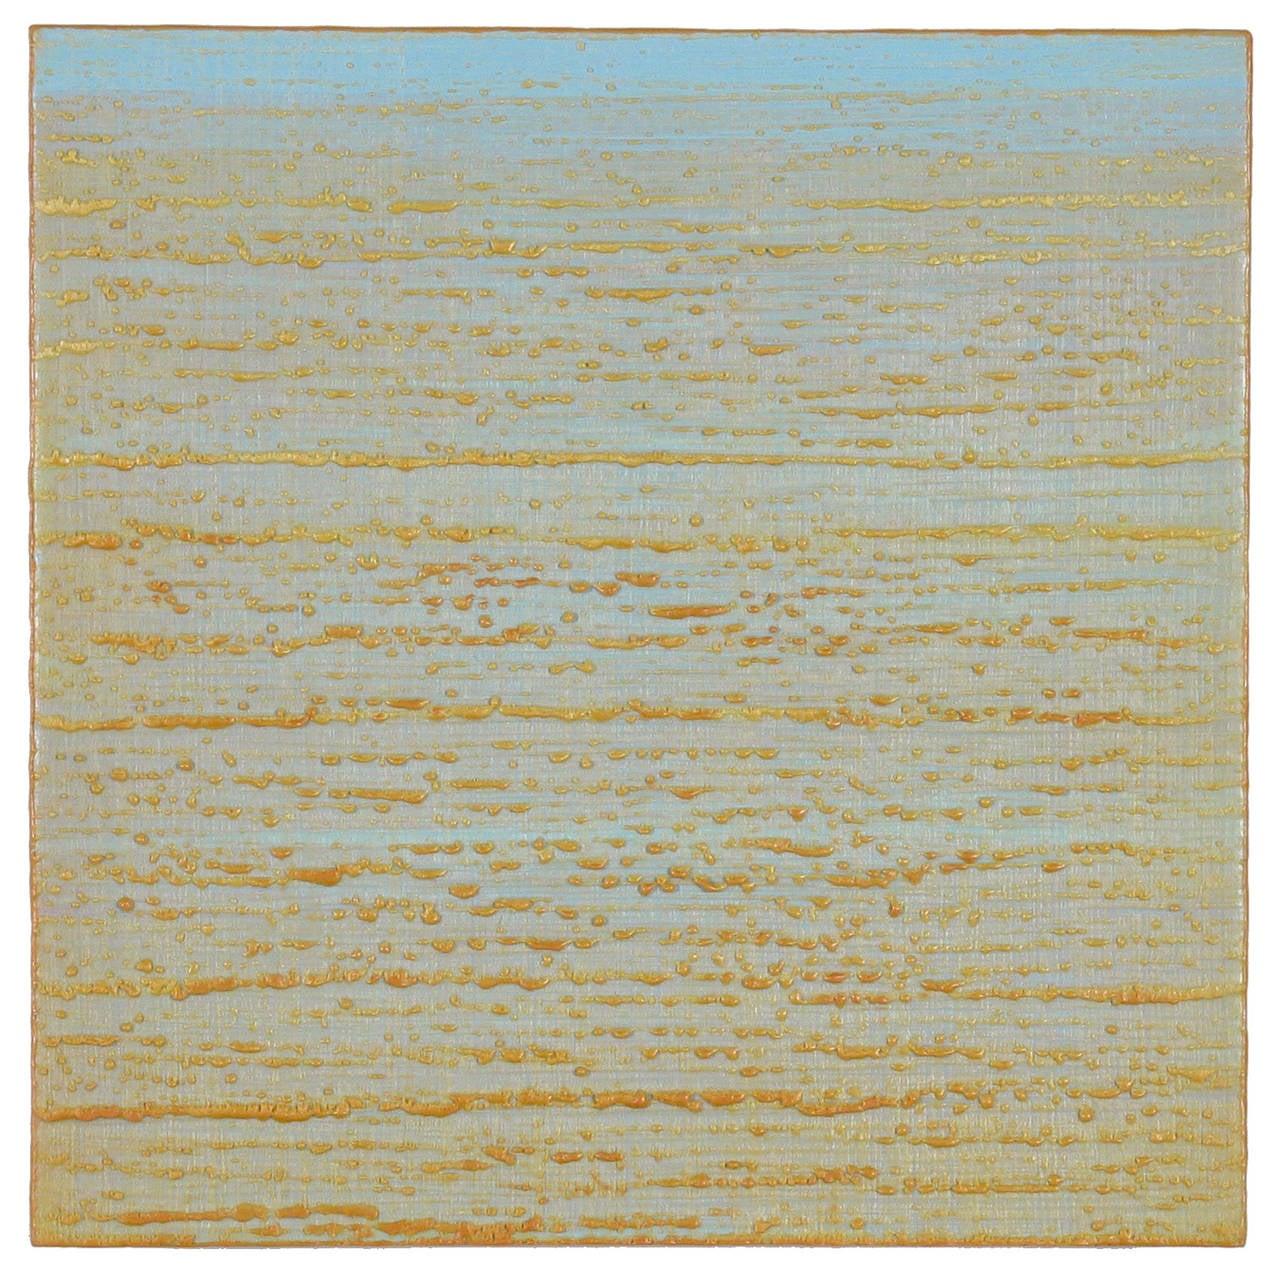 Joanne Mattera - Silk Road 273, Pale Blue and Sand Encaustic Color ...